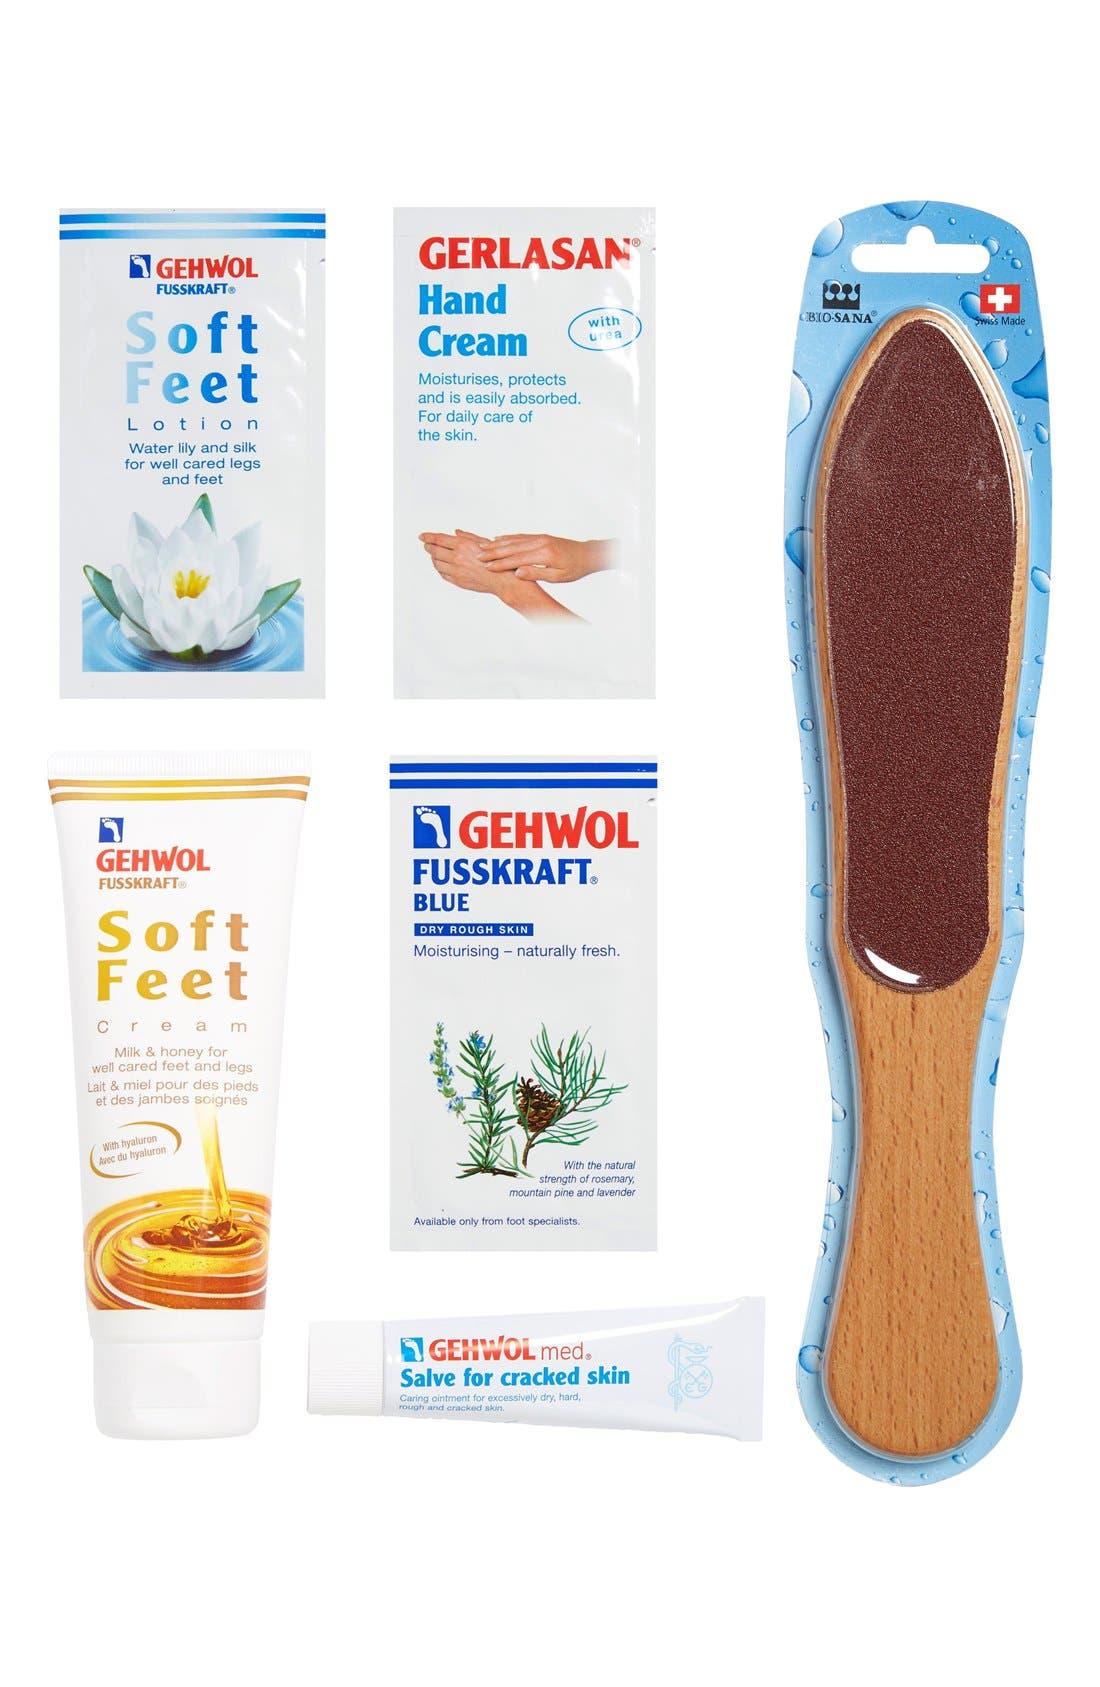 GEHWOL® Soft Feet Treatment Kit ($55 Value)